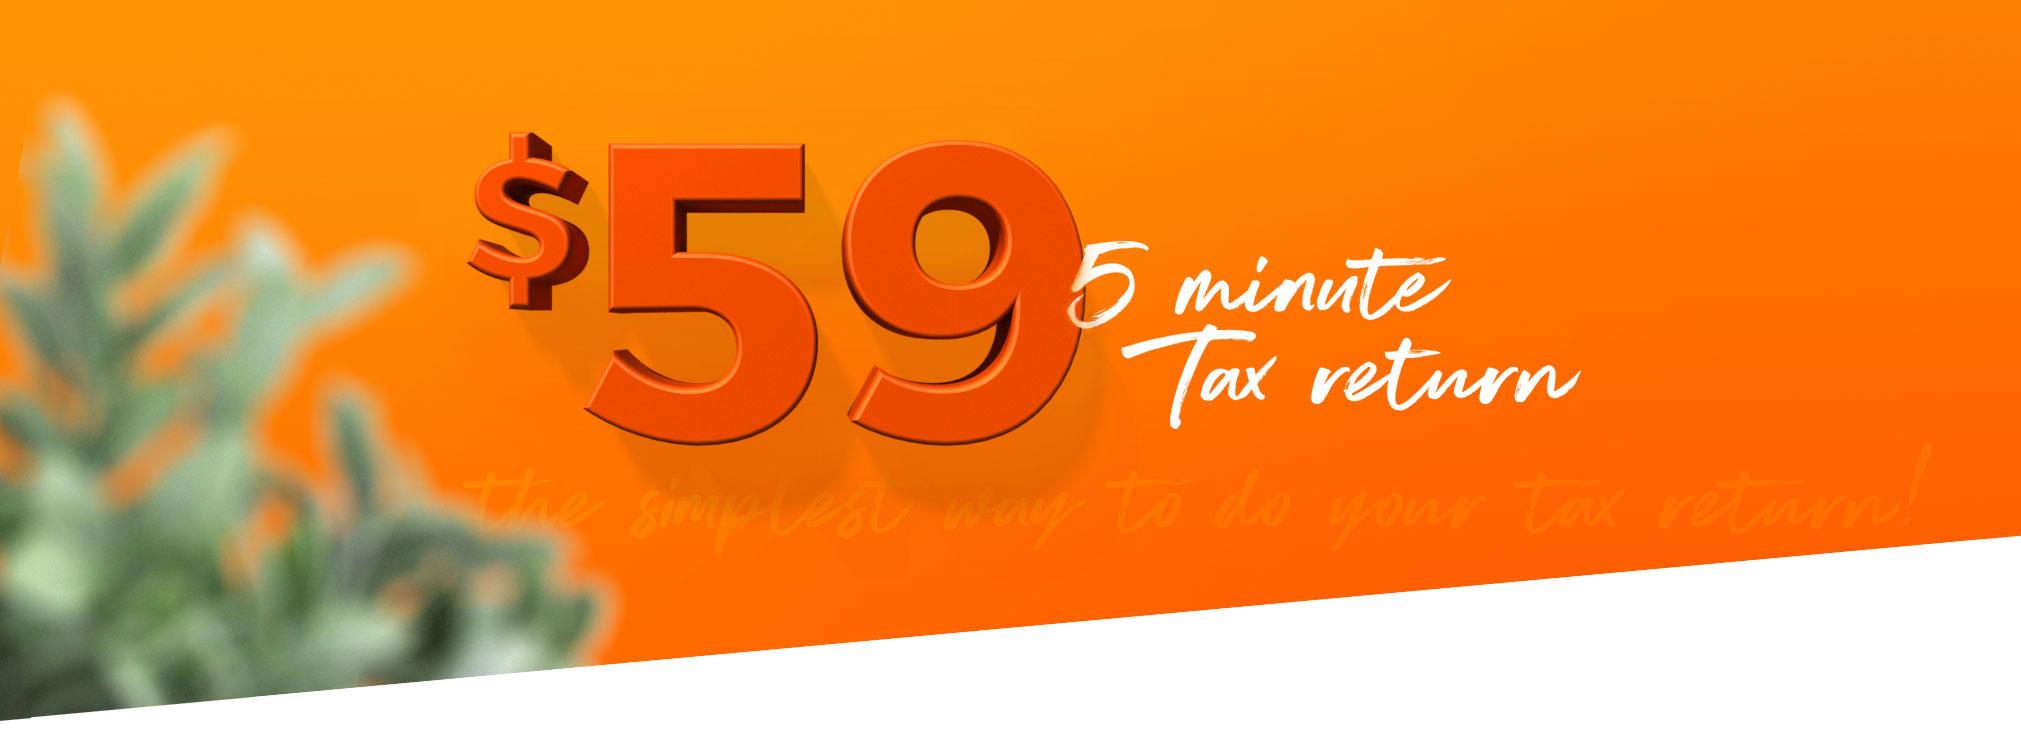 One Click Tax - Bedford, WA 6052 - 1300 707 117 | ShowMeLocal.com